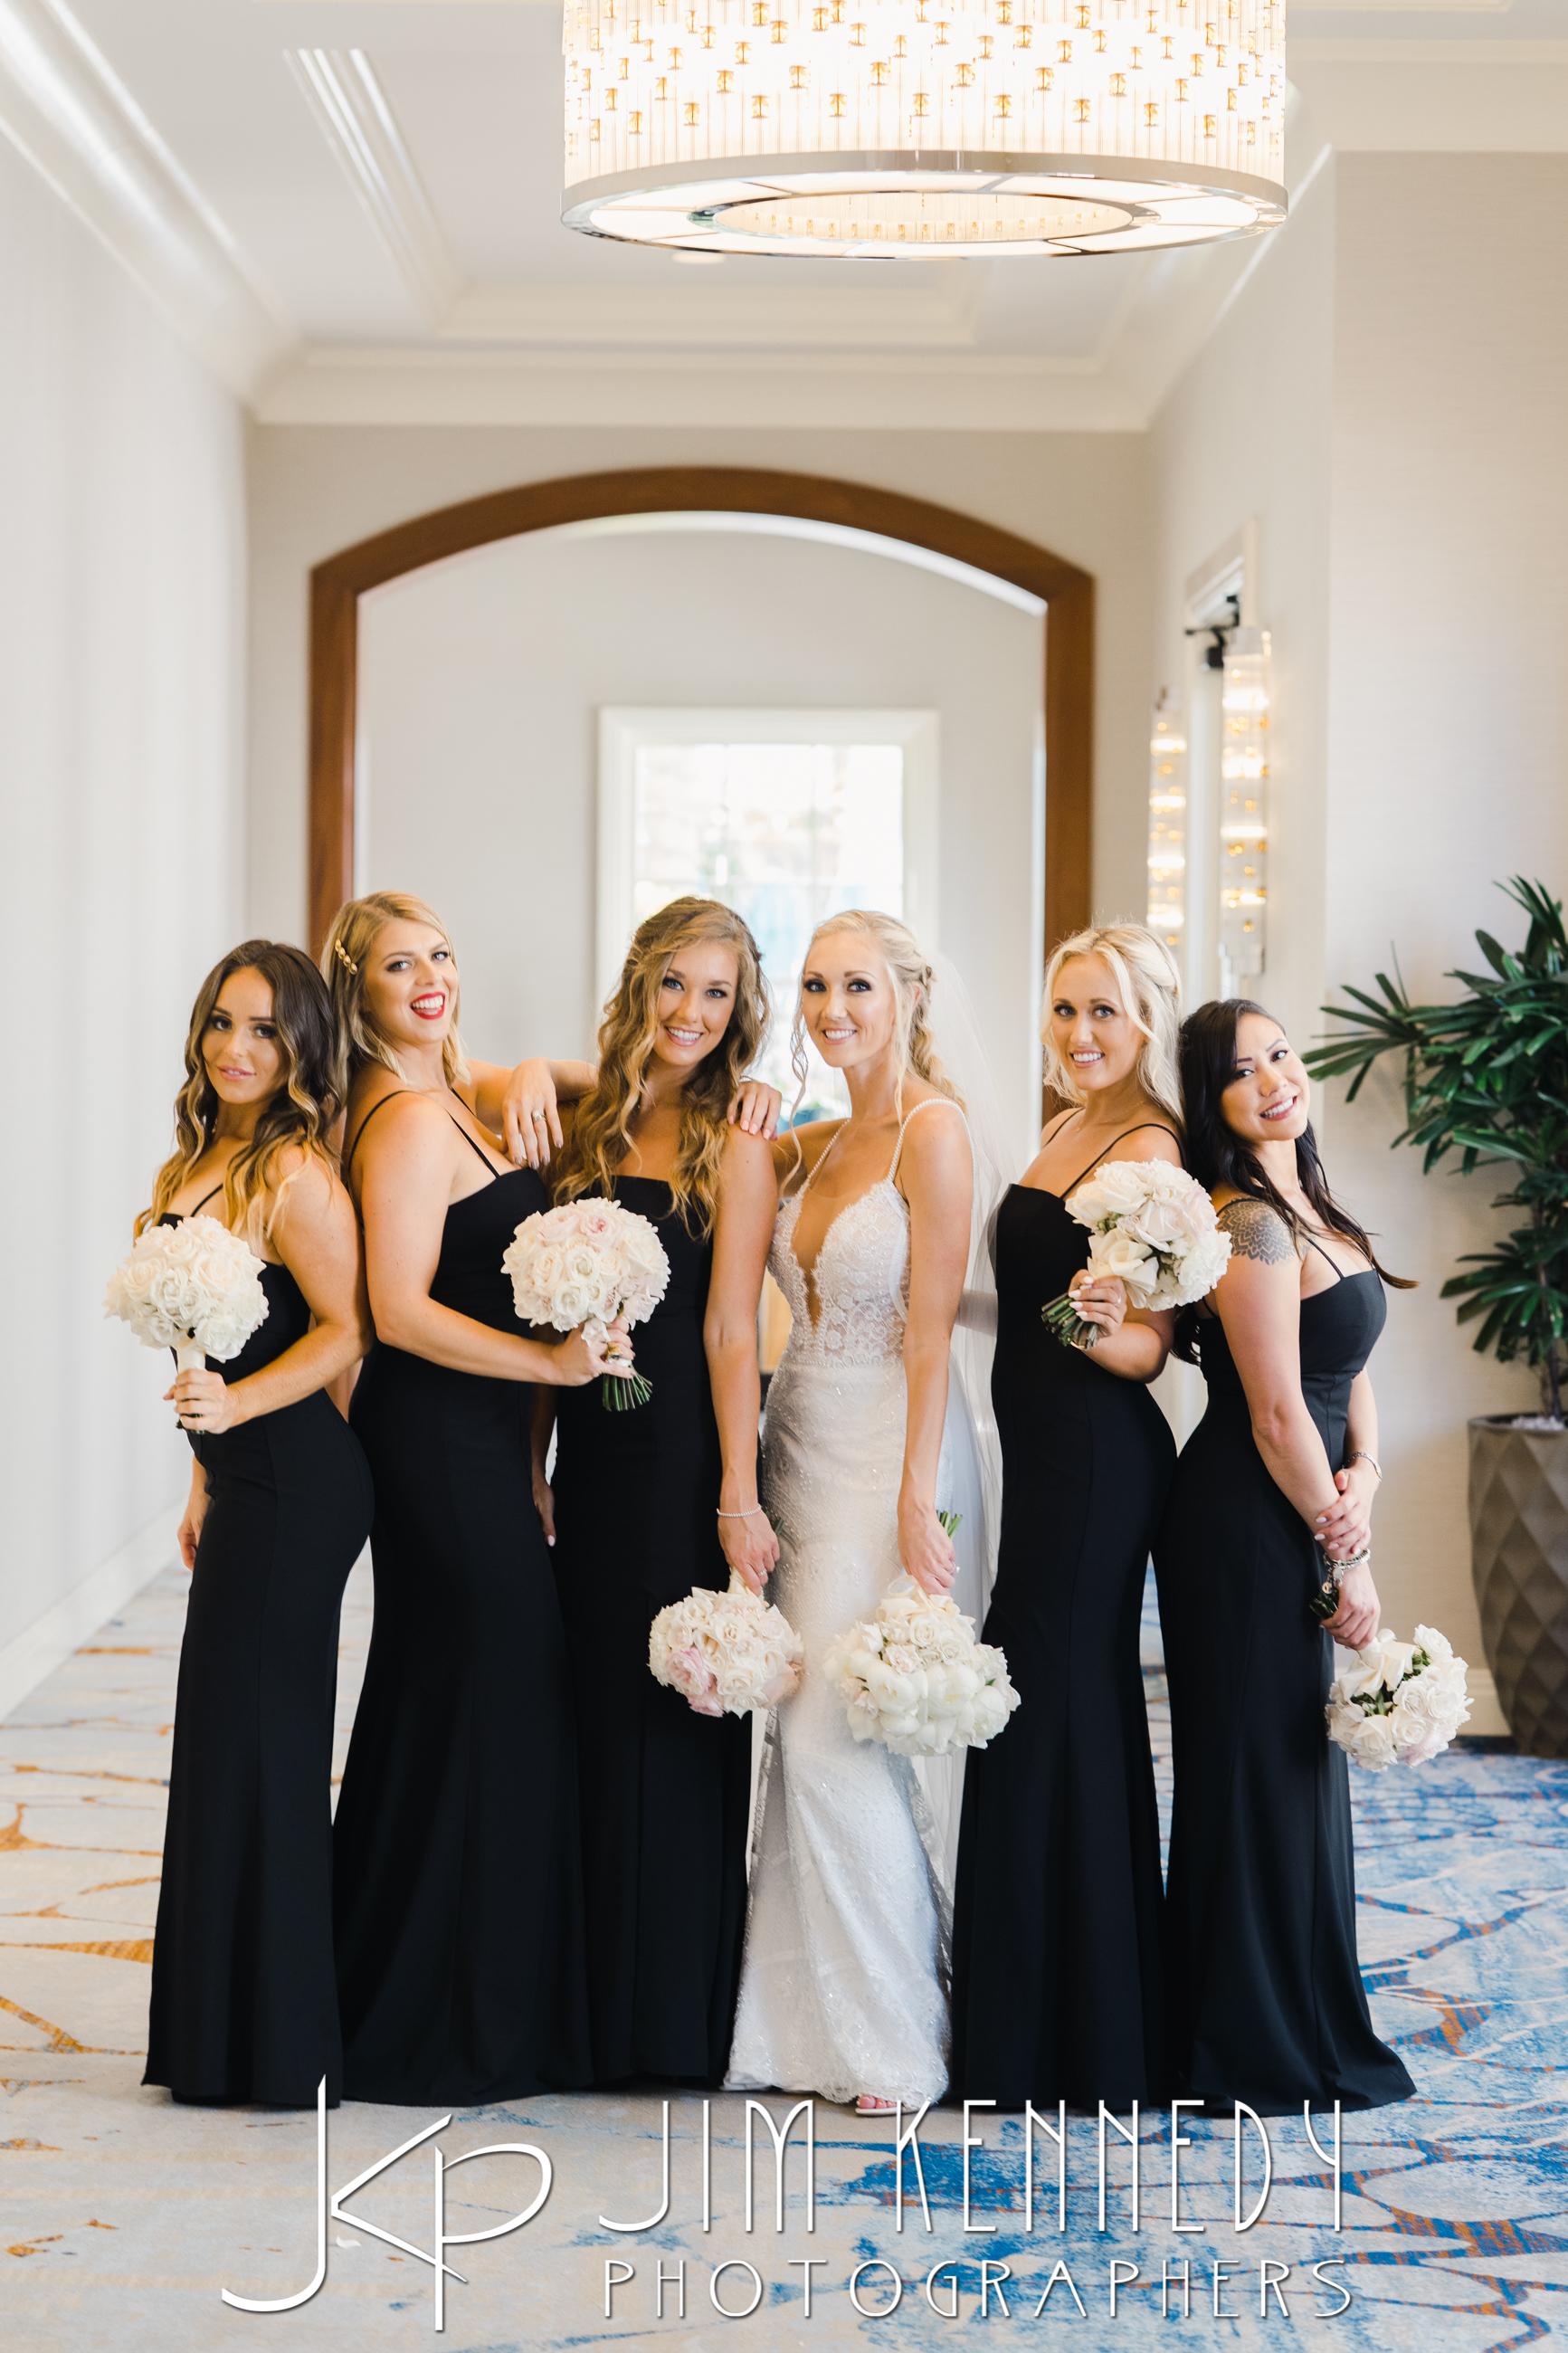 balboa-bay-resort-wedding-brooke-kevin_0062.JPG